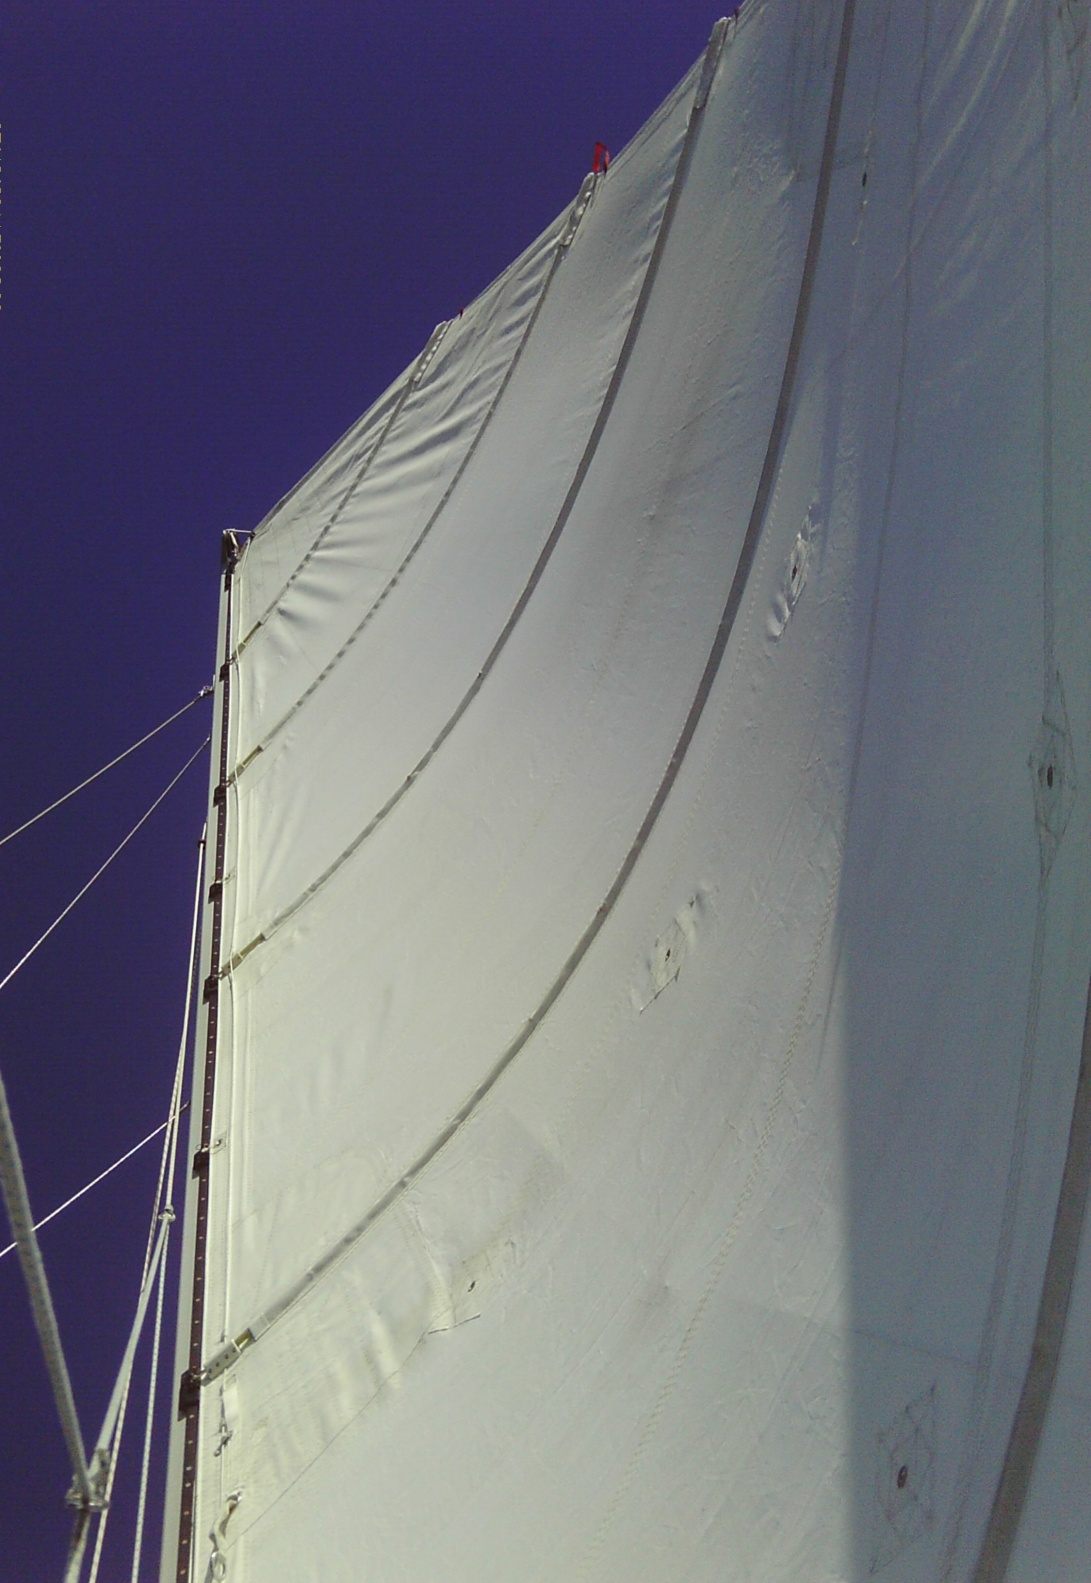 Click image for larger version  Name:Main sail.jpg Views:417 Size:402.5 KB ID:143384